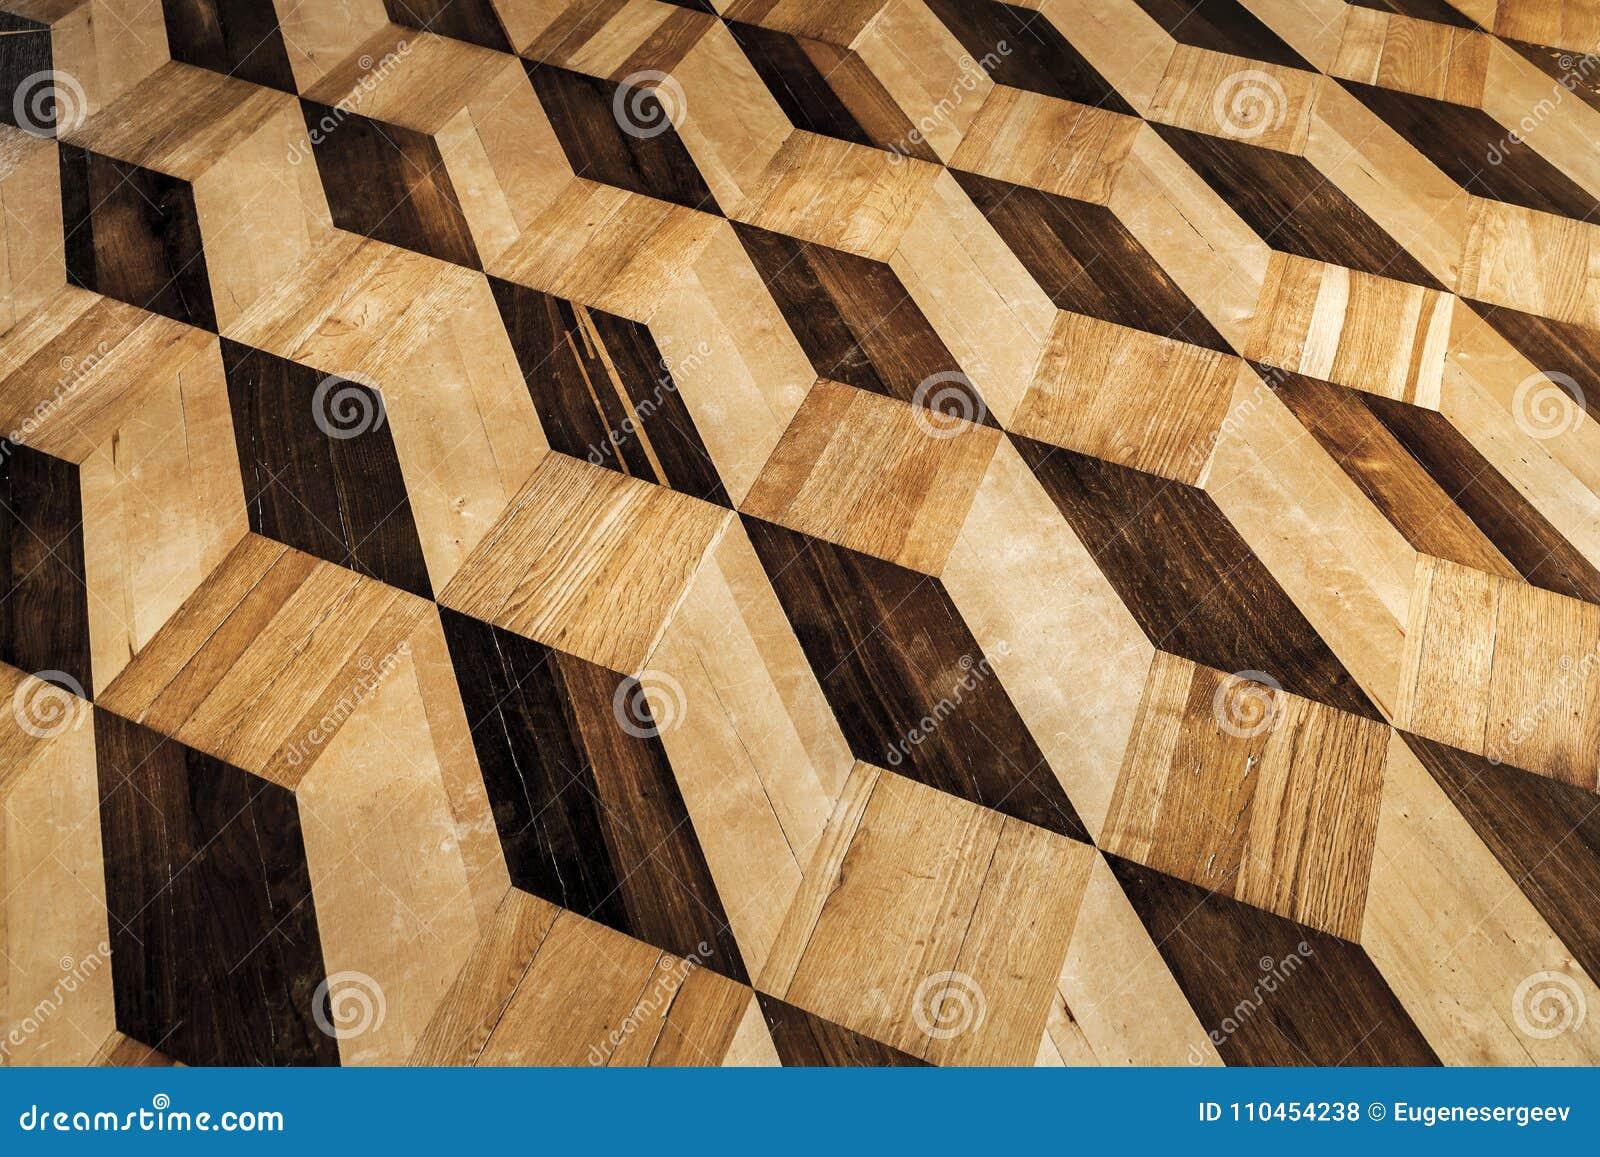 Gammal träparkettdesign